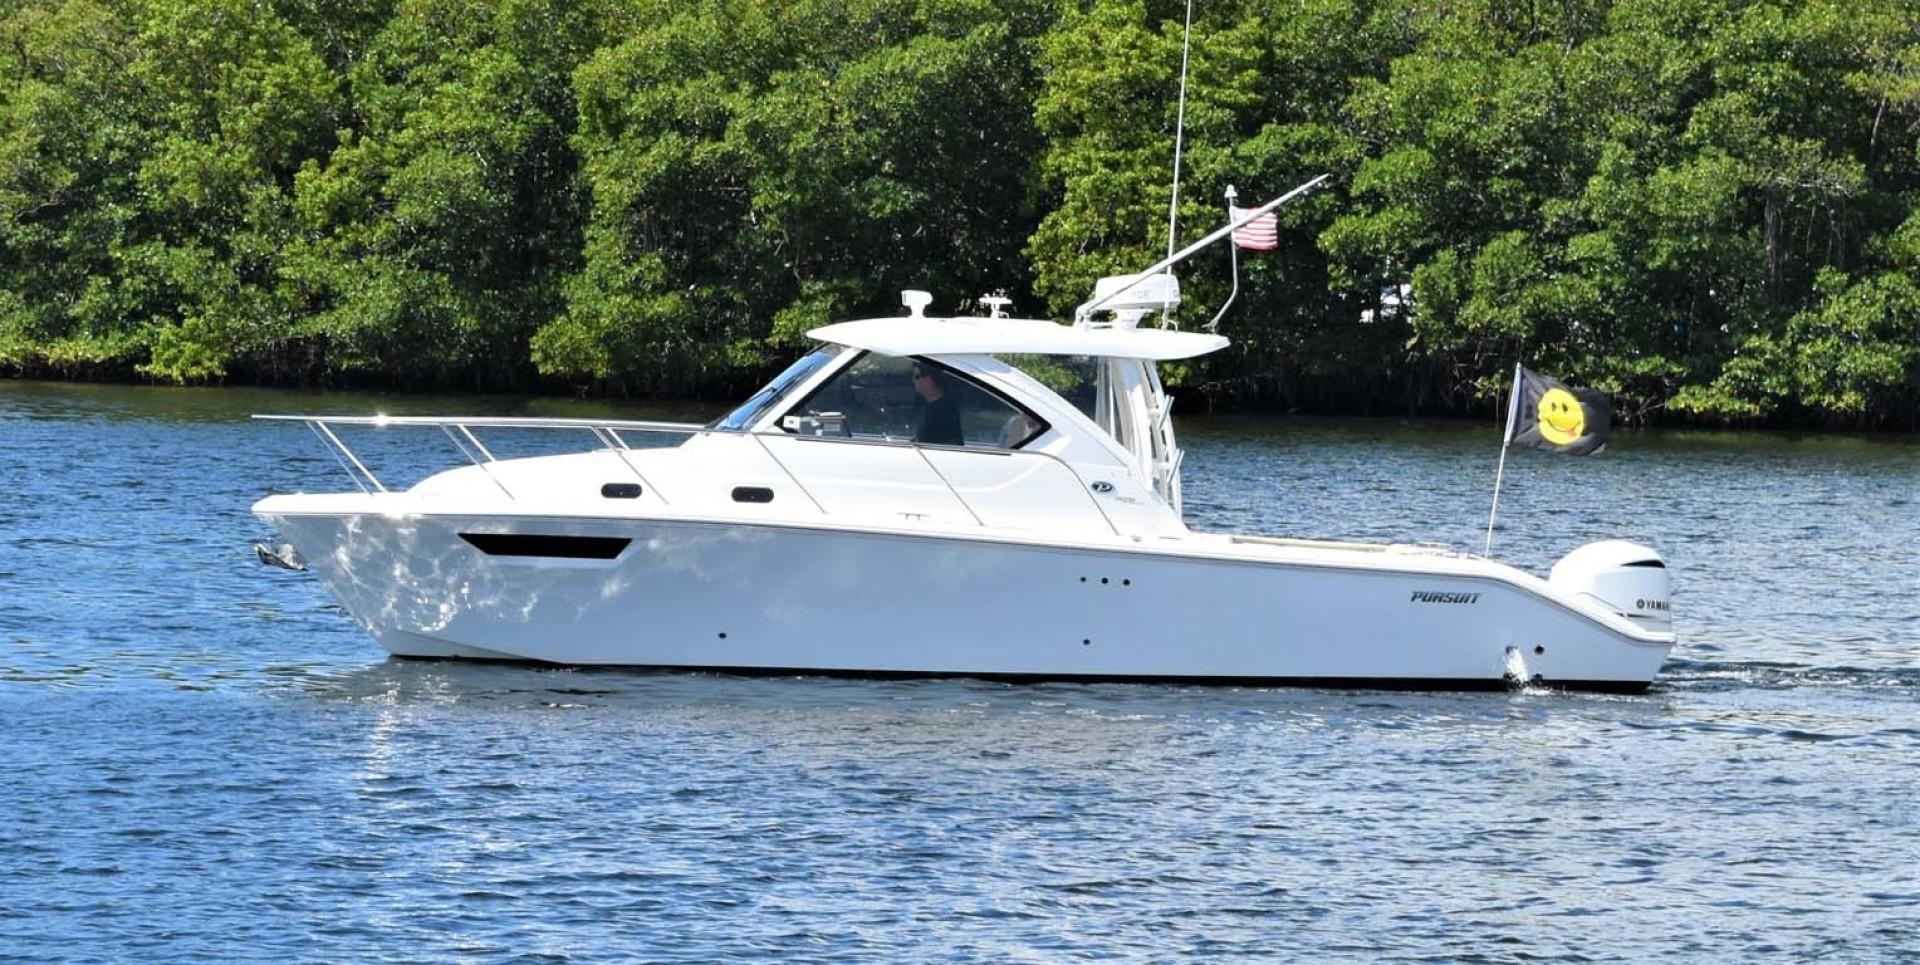 Pursuit-325 Offshore 2020-Coo Coo Miami-Florida-United States-Port Profile-1475317 | Thumbnail